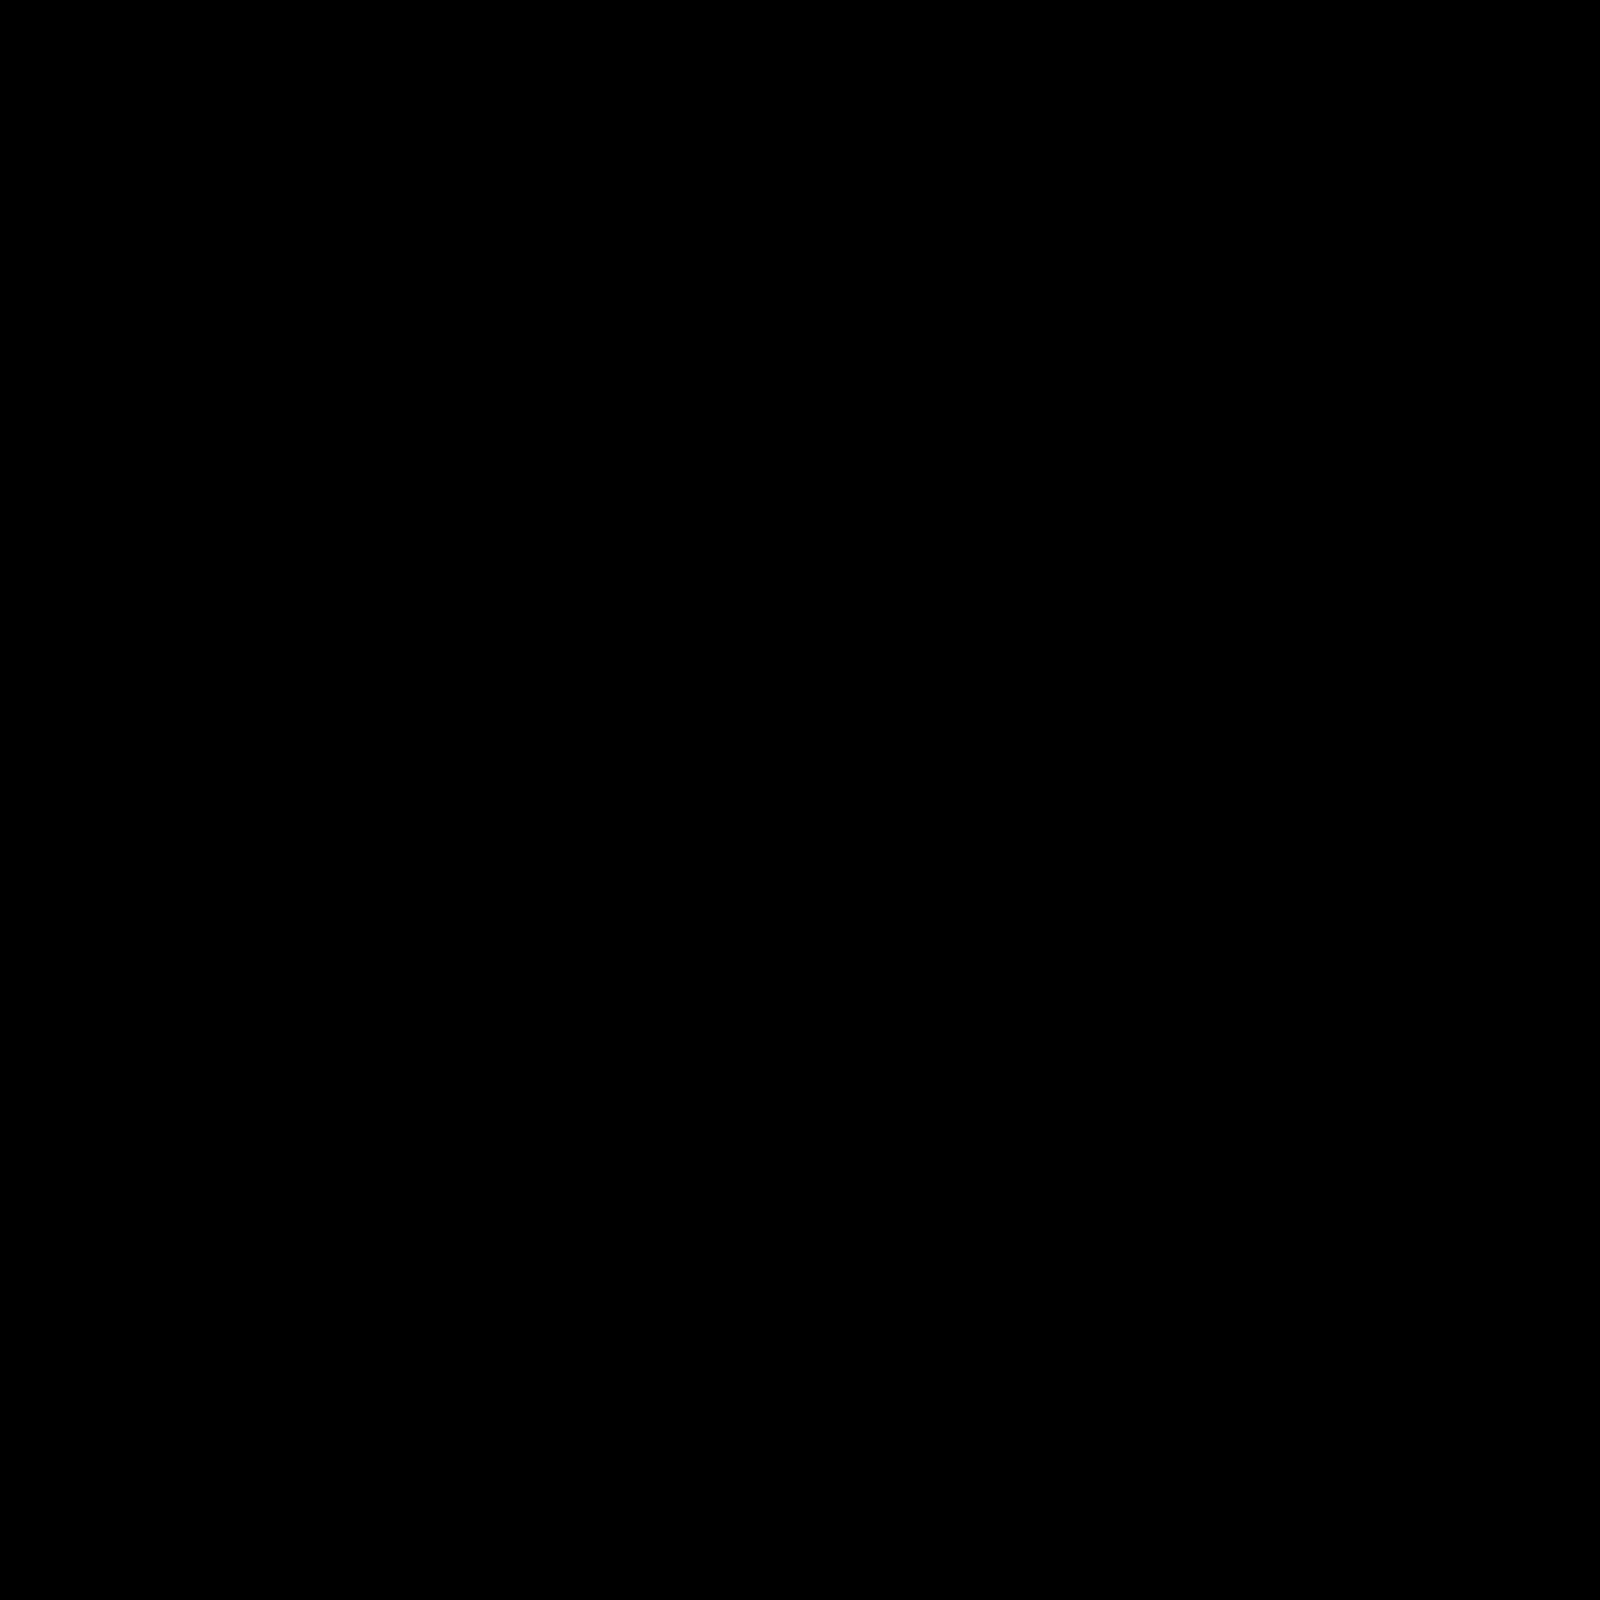 Razor Filled icon